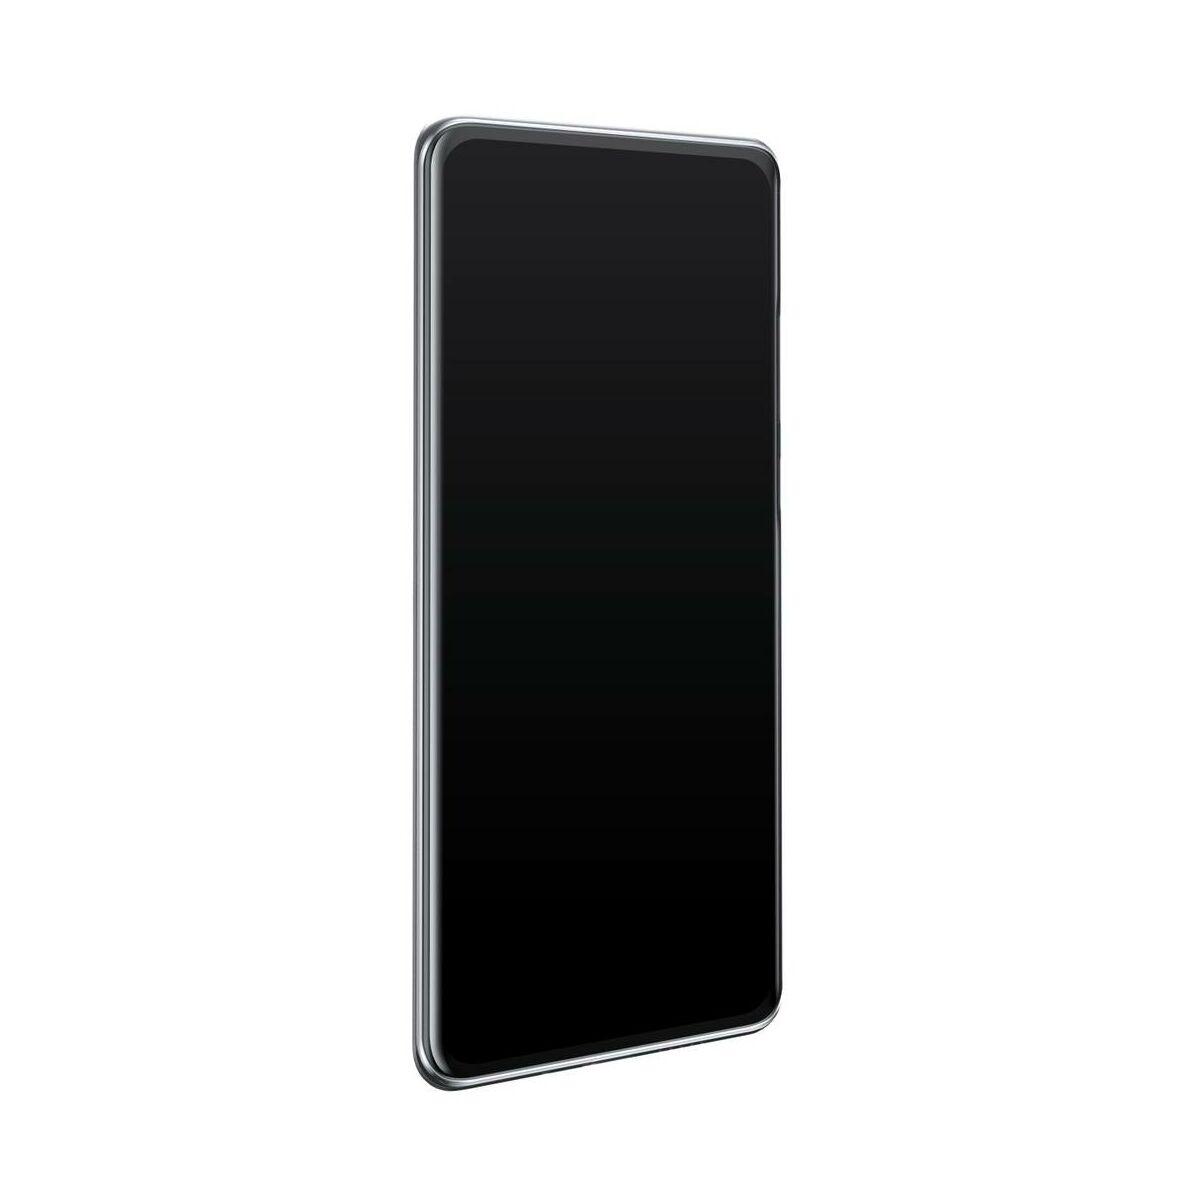 Baseus Huawei P30 Pro tok, Wing, fehér (WIHWP30P-02)